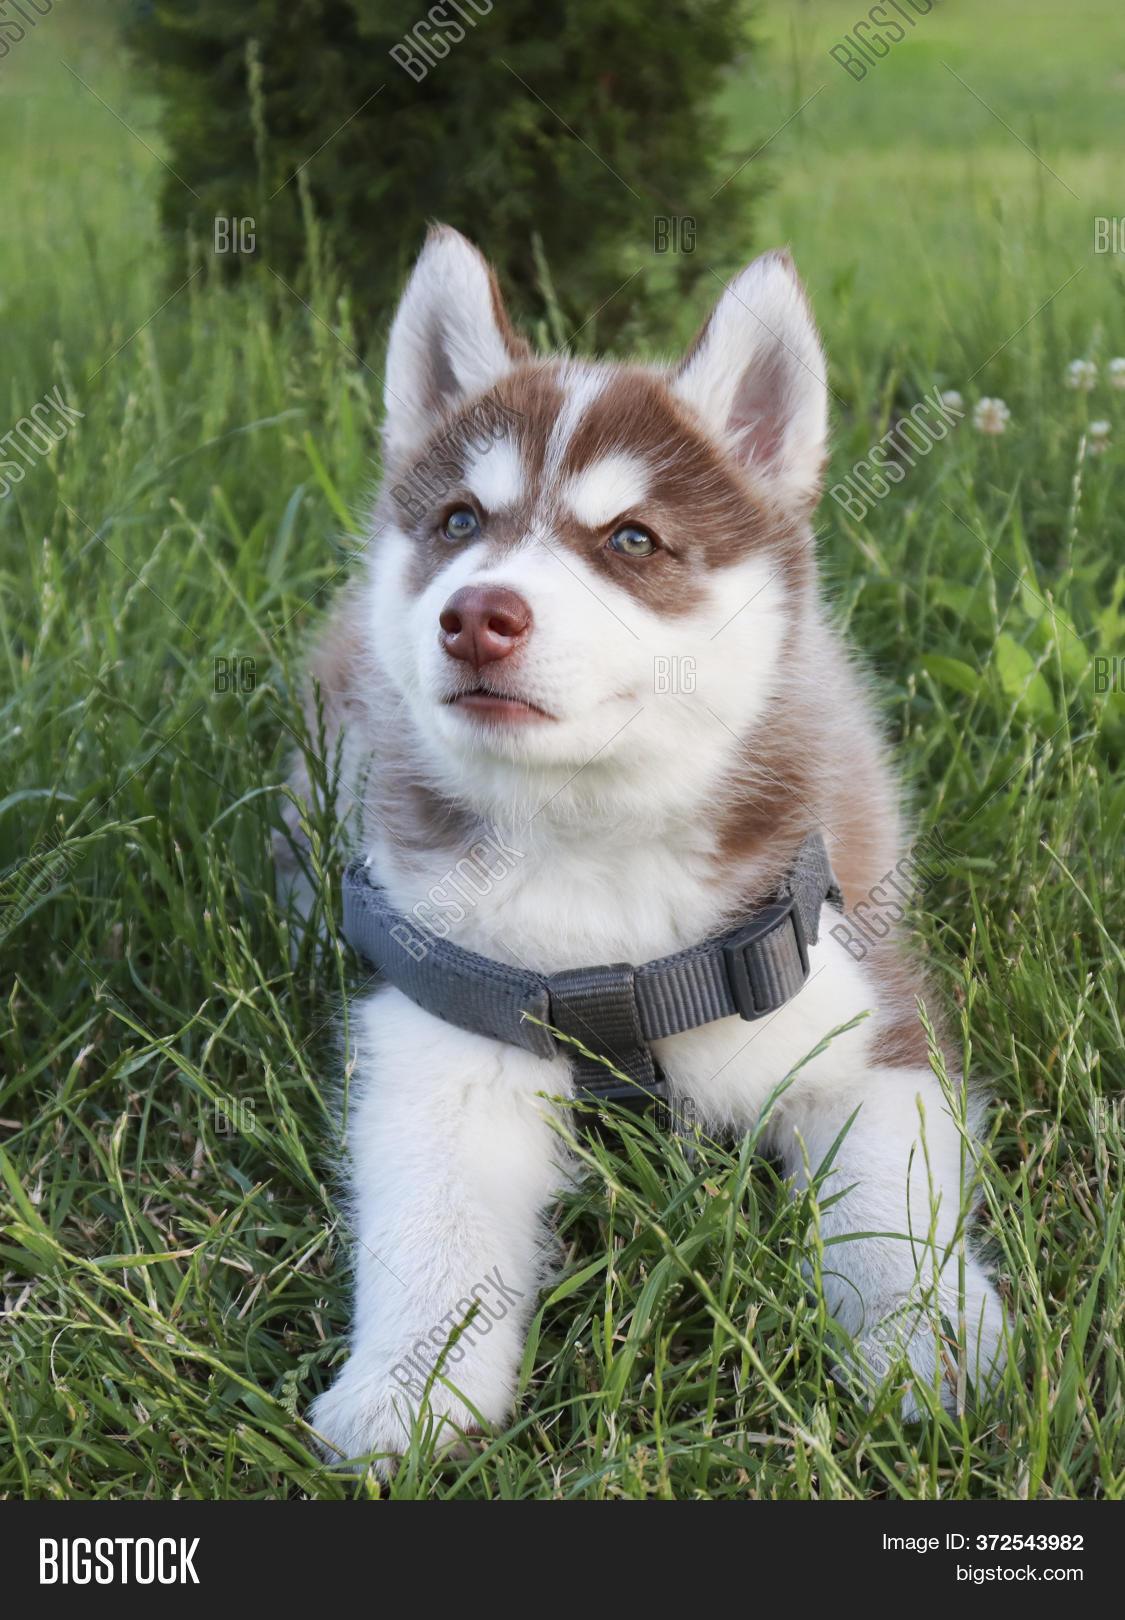 Cute Husky Puppy Plays Image Photo Free Trial Bigstock